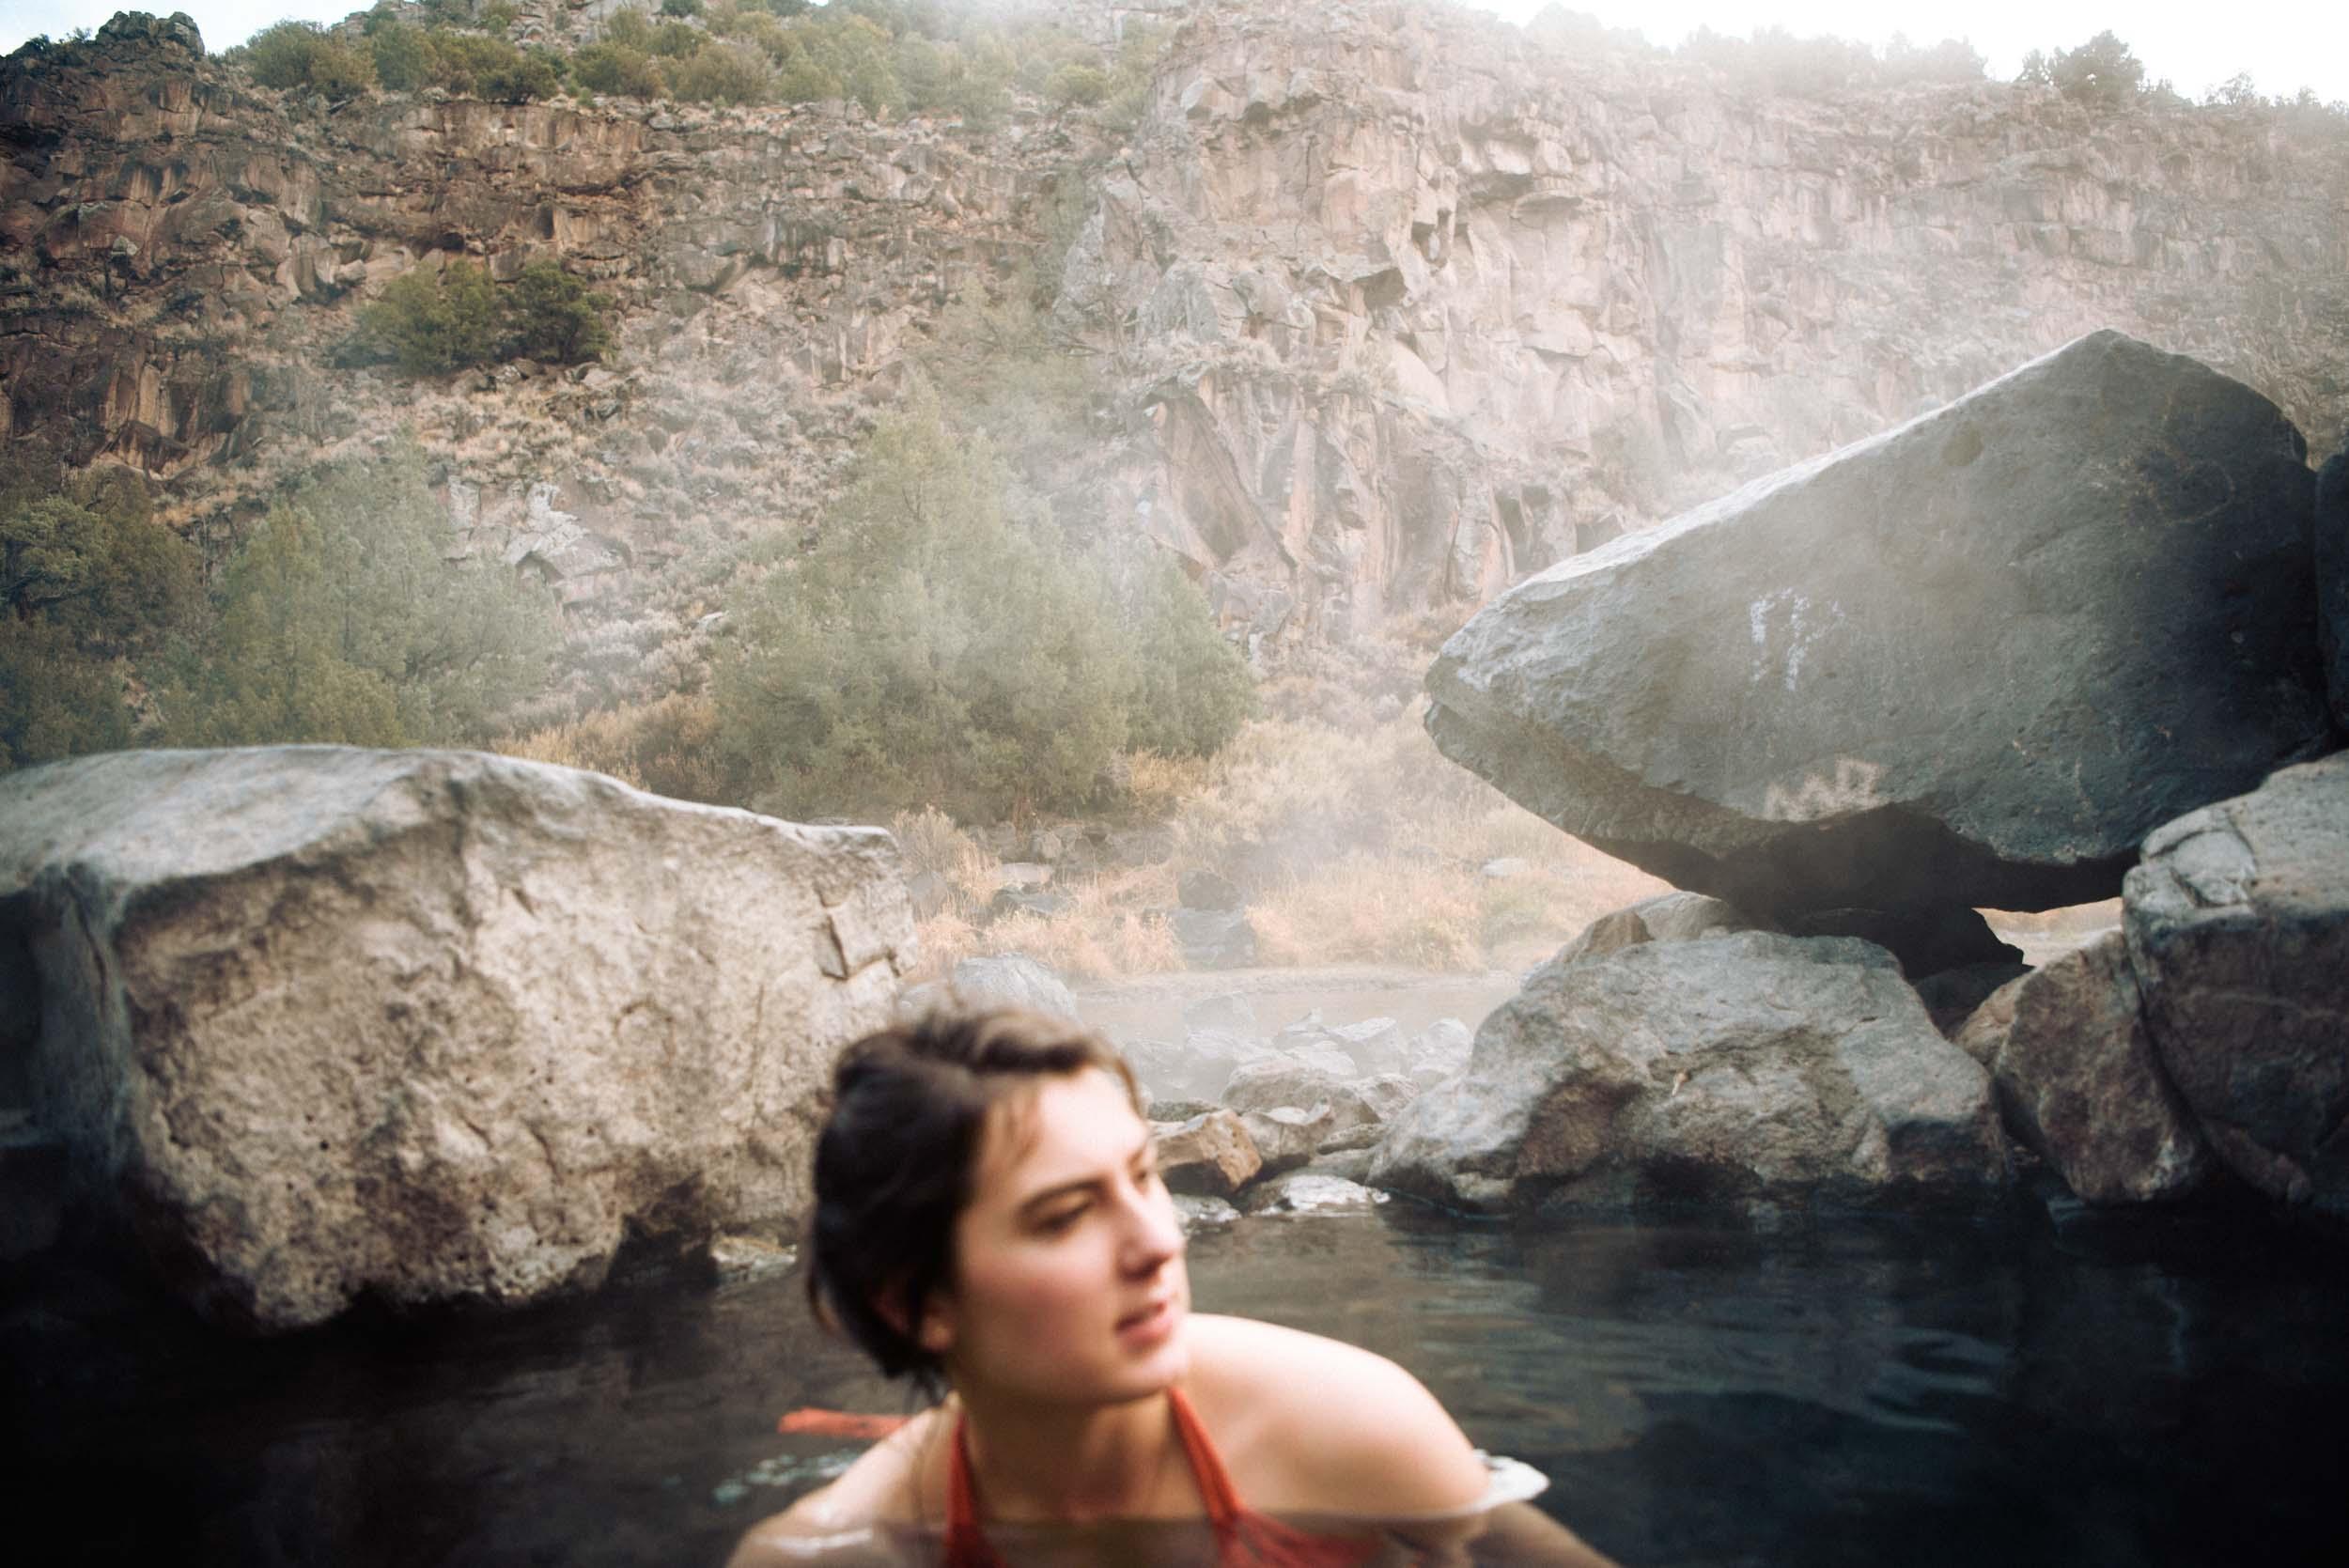 Miriam-Subbiah-Taos-17.jpg